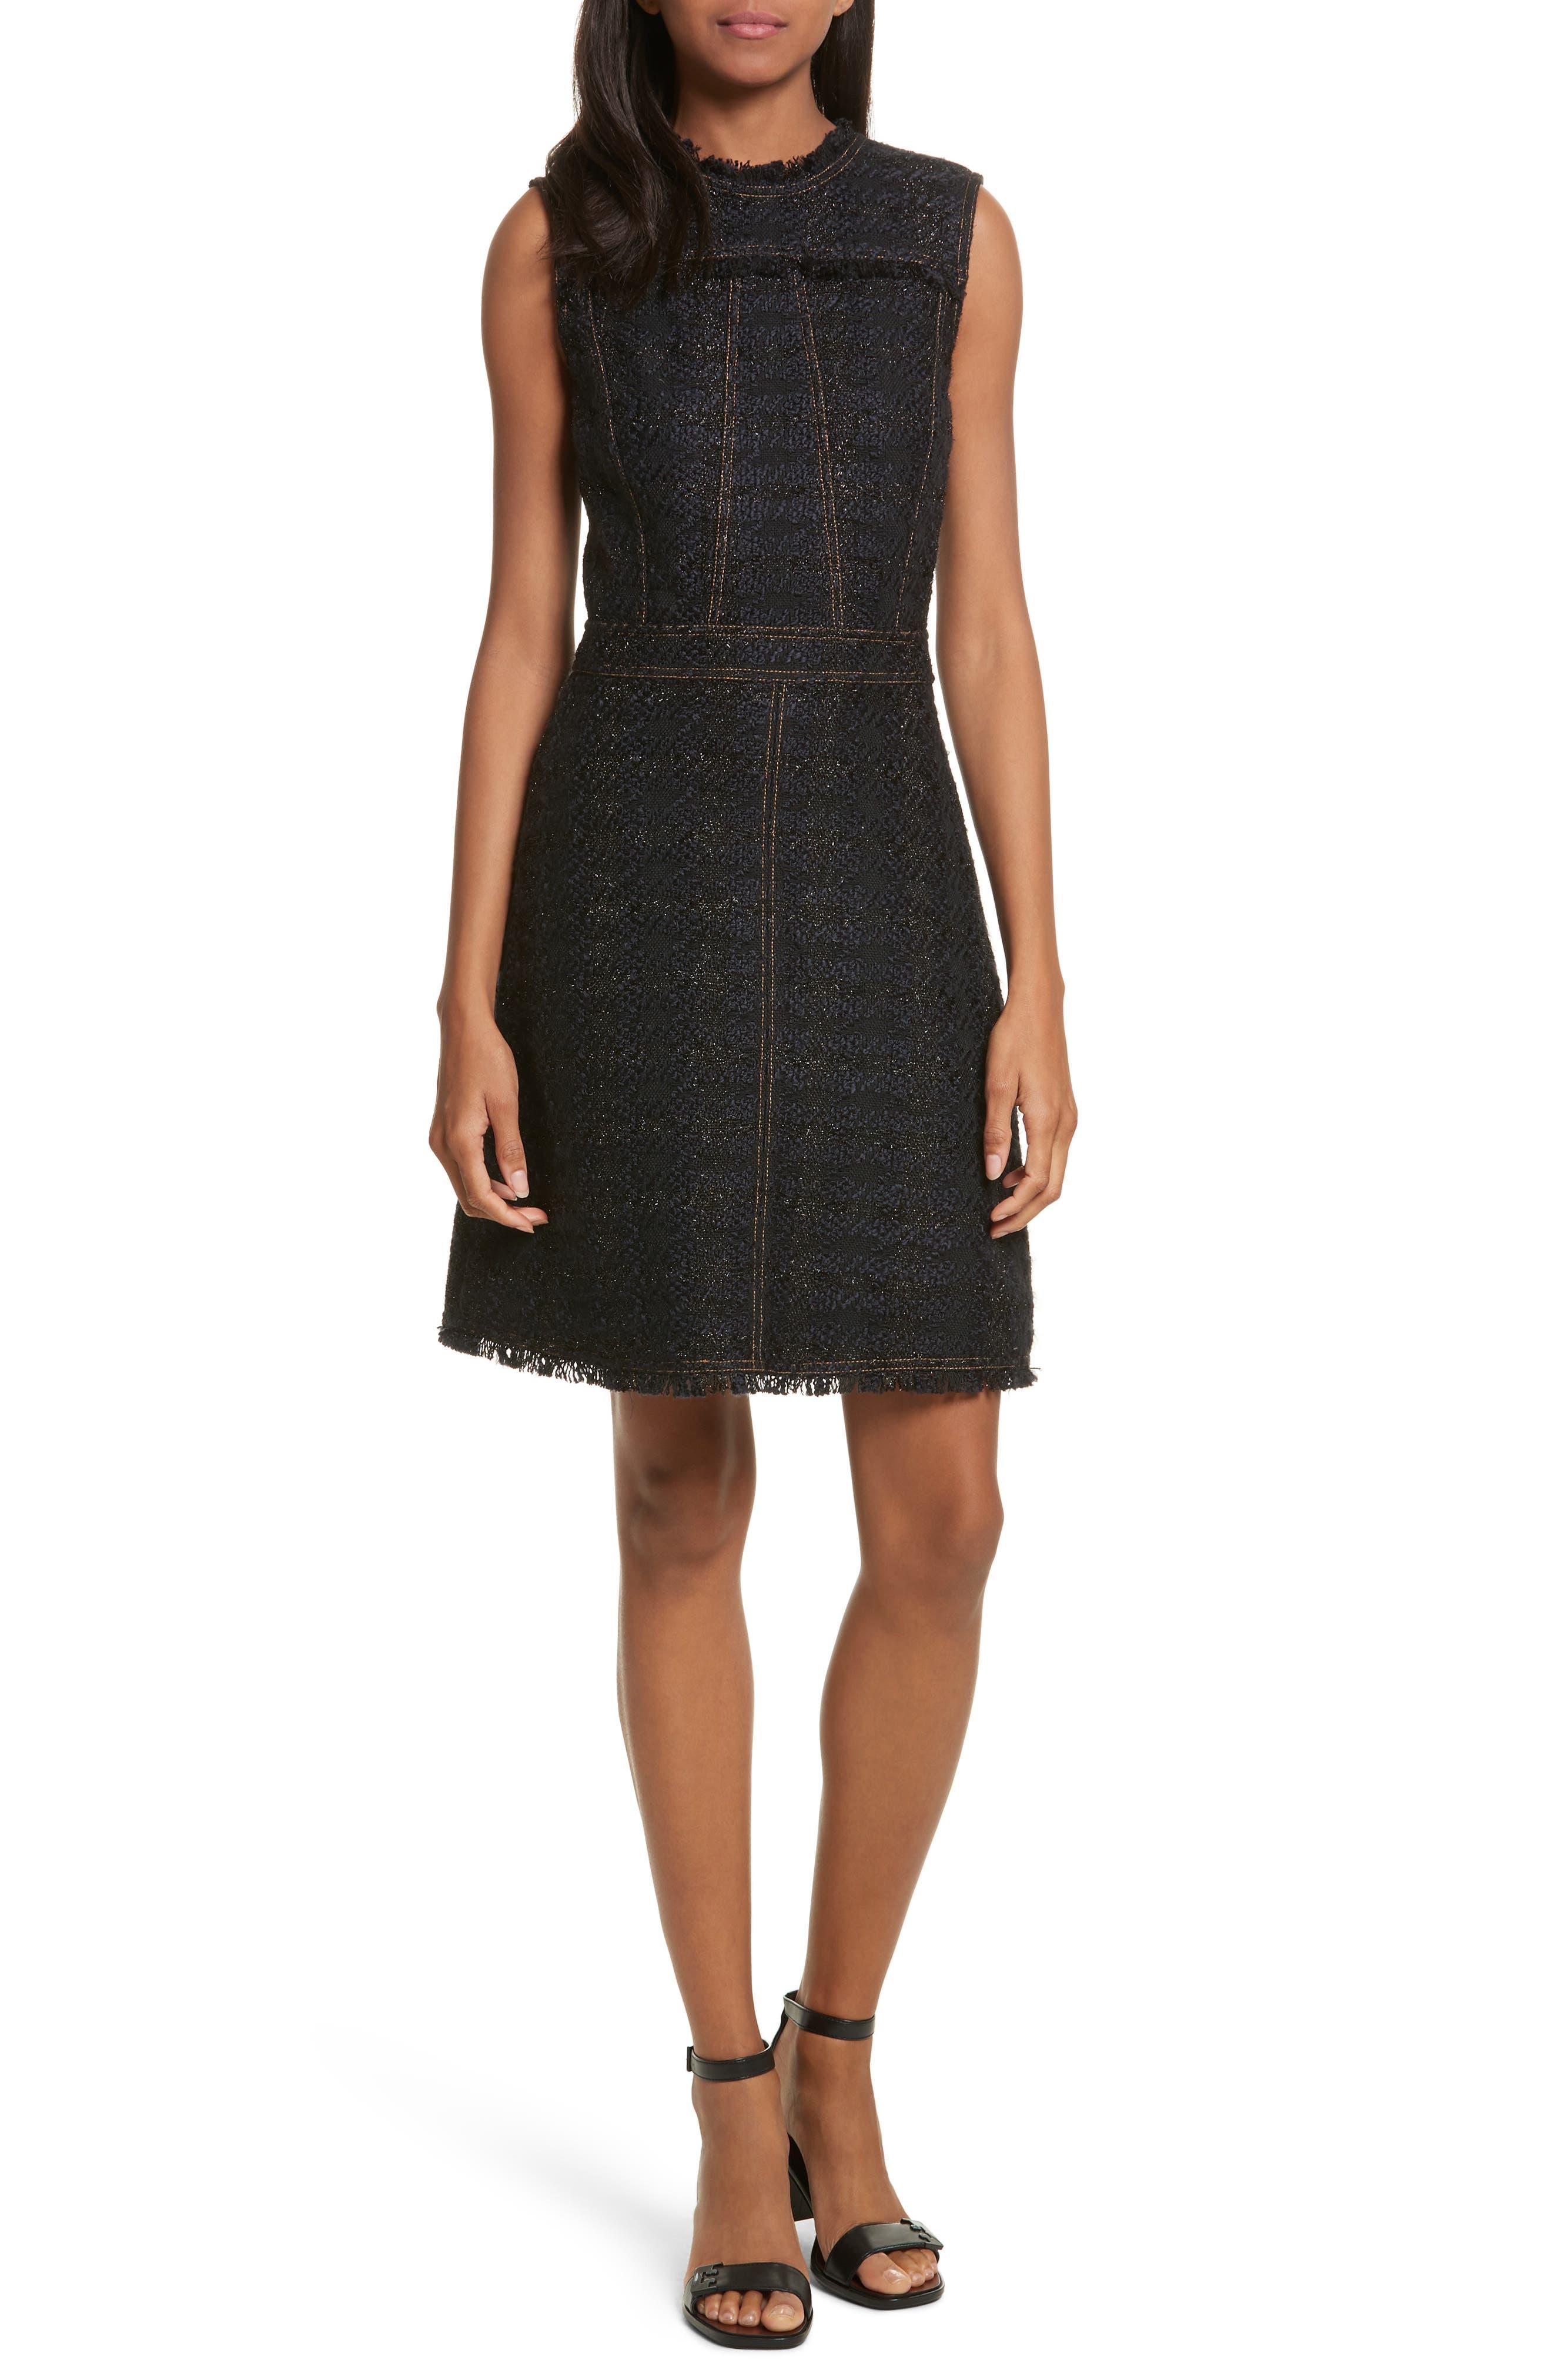 Aria Tweed Sheath Dress,                         Main,                         color, Black/ Black Metal Check Tweed